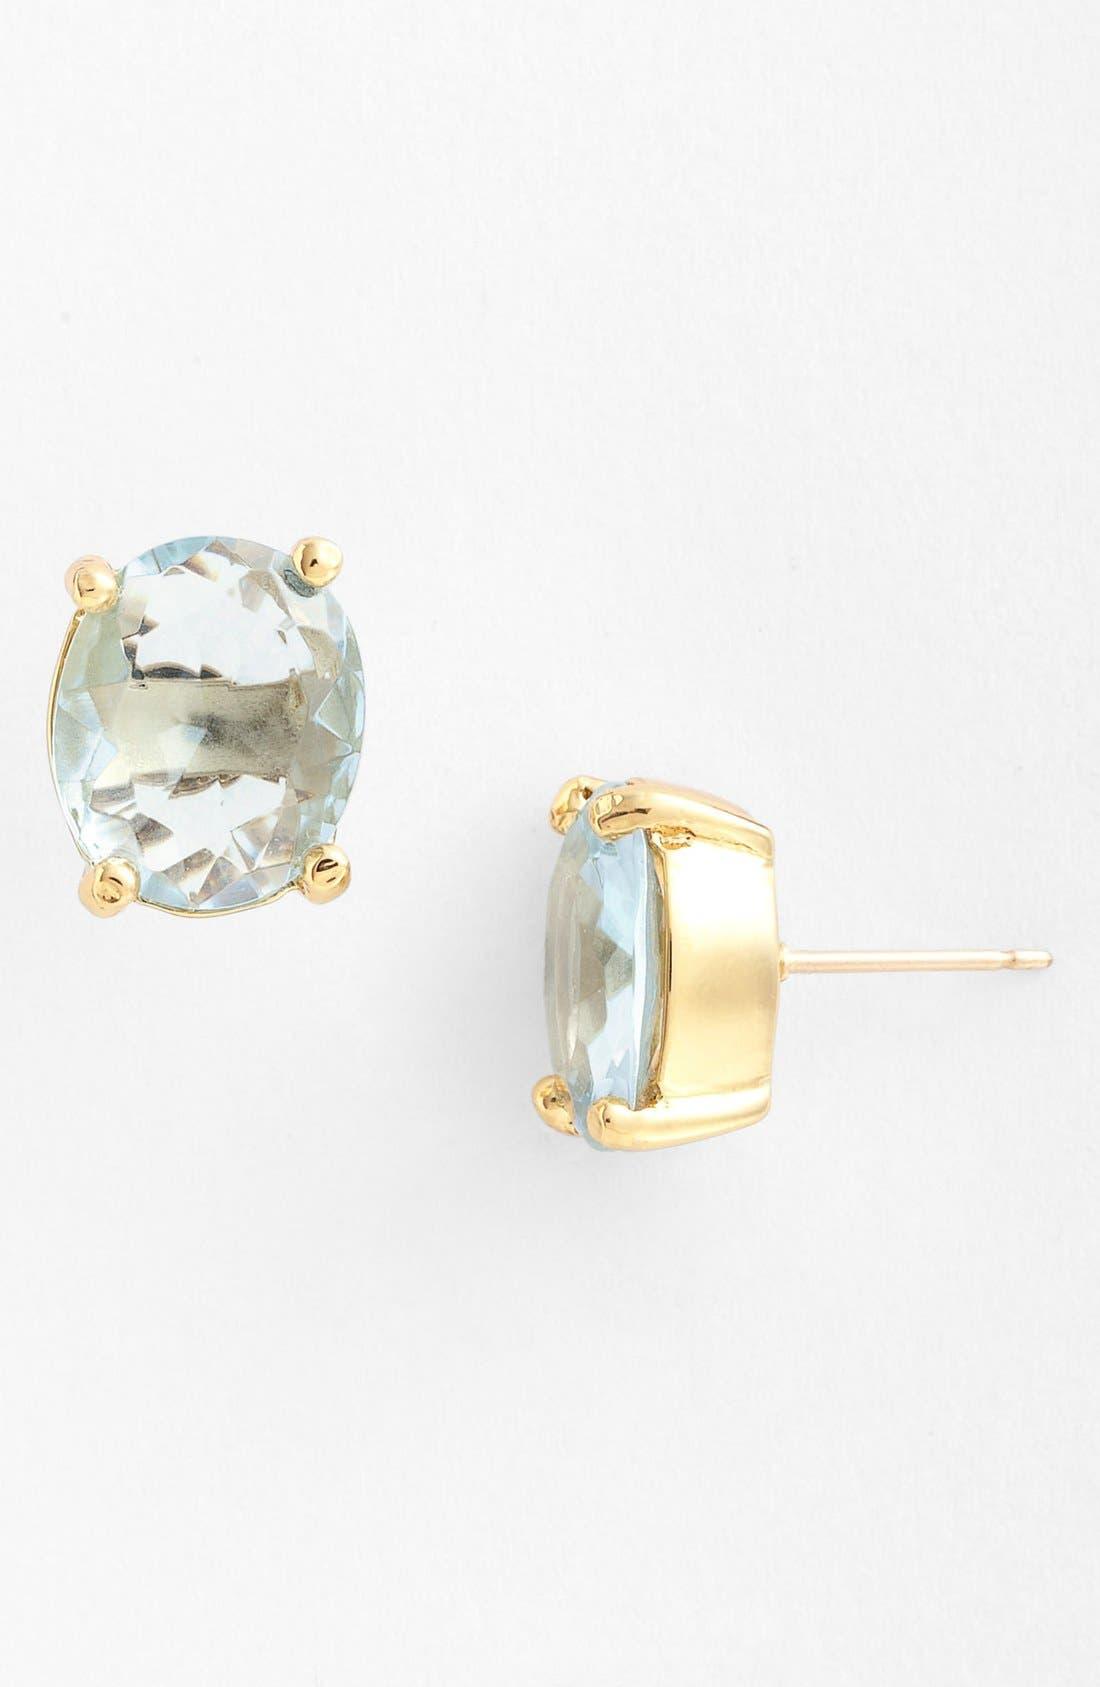 Main Image - kate spade new york oval stud earrings (Nordstrom Exclusive)